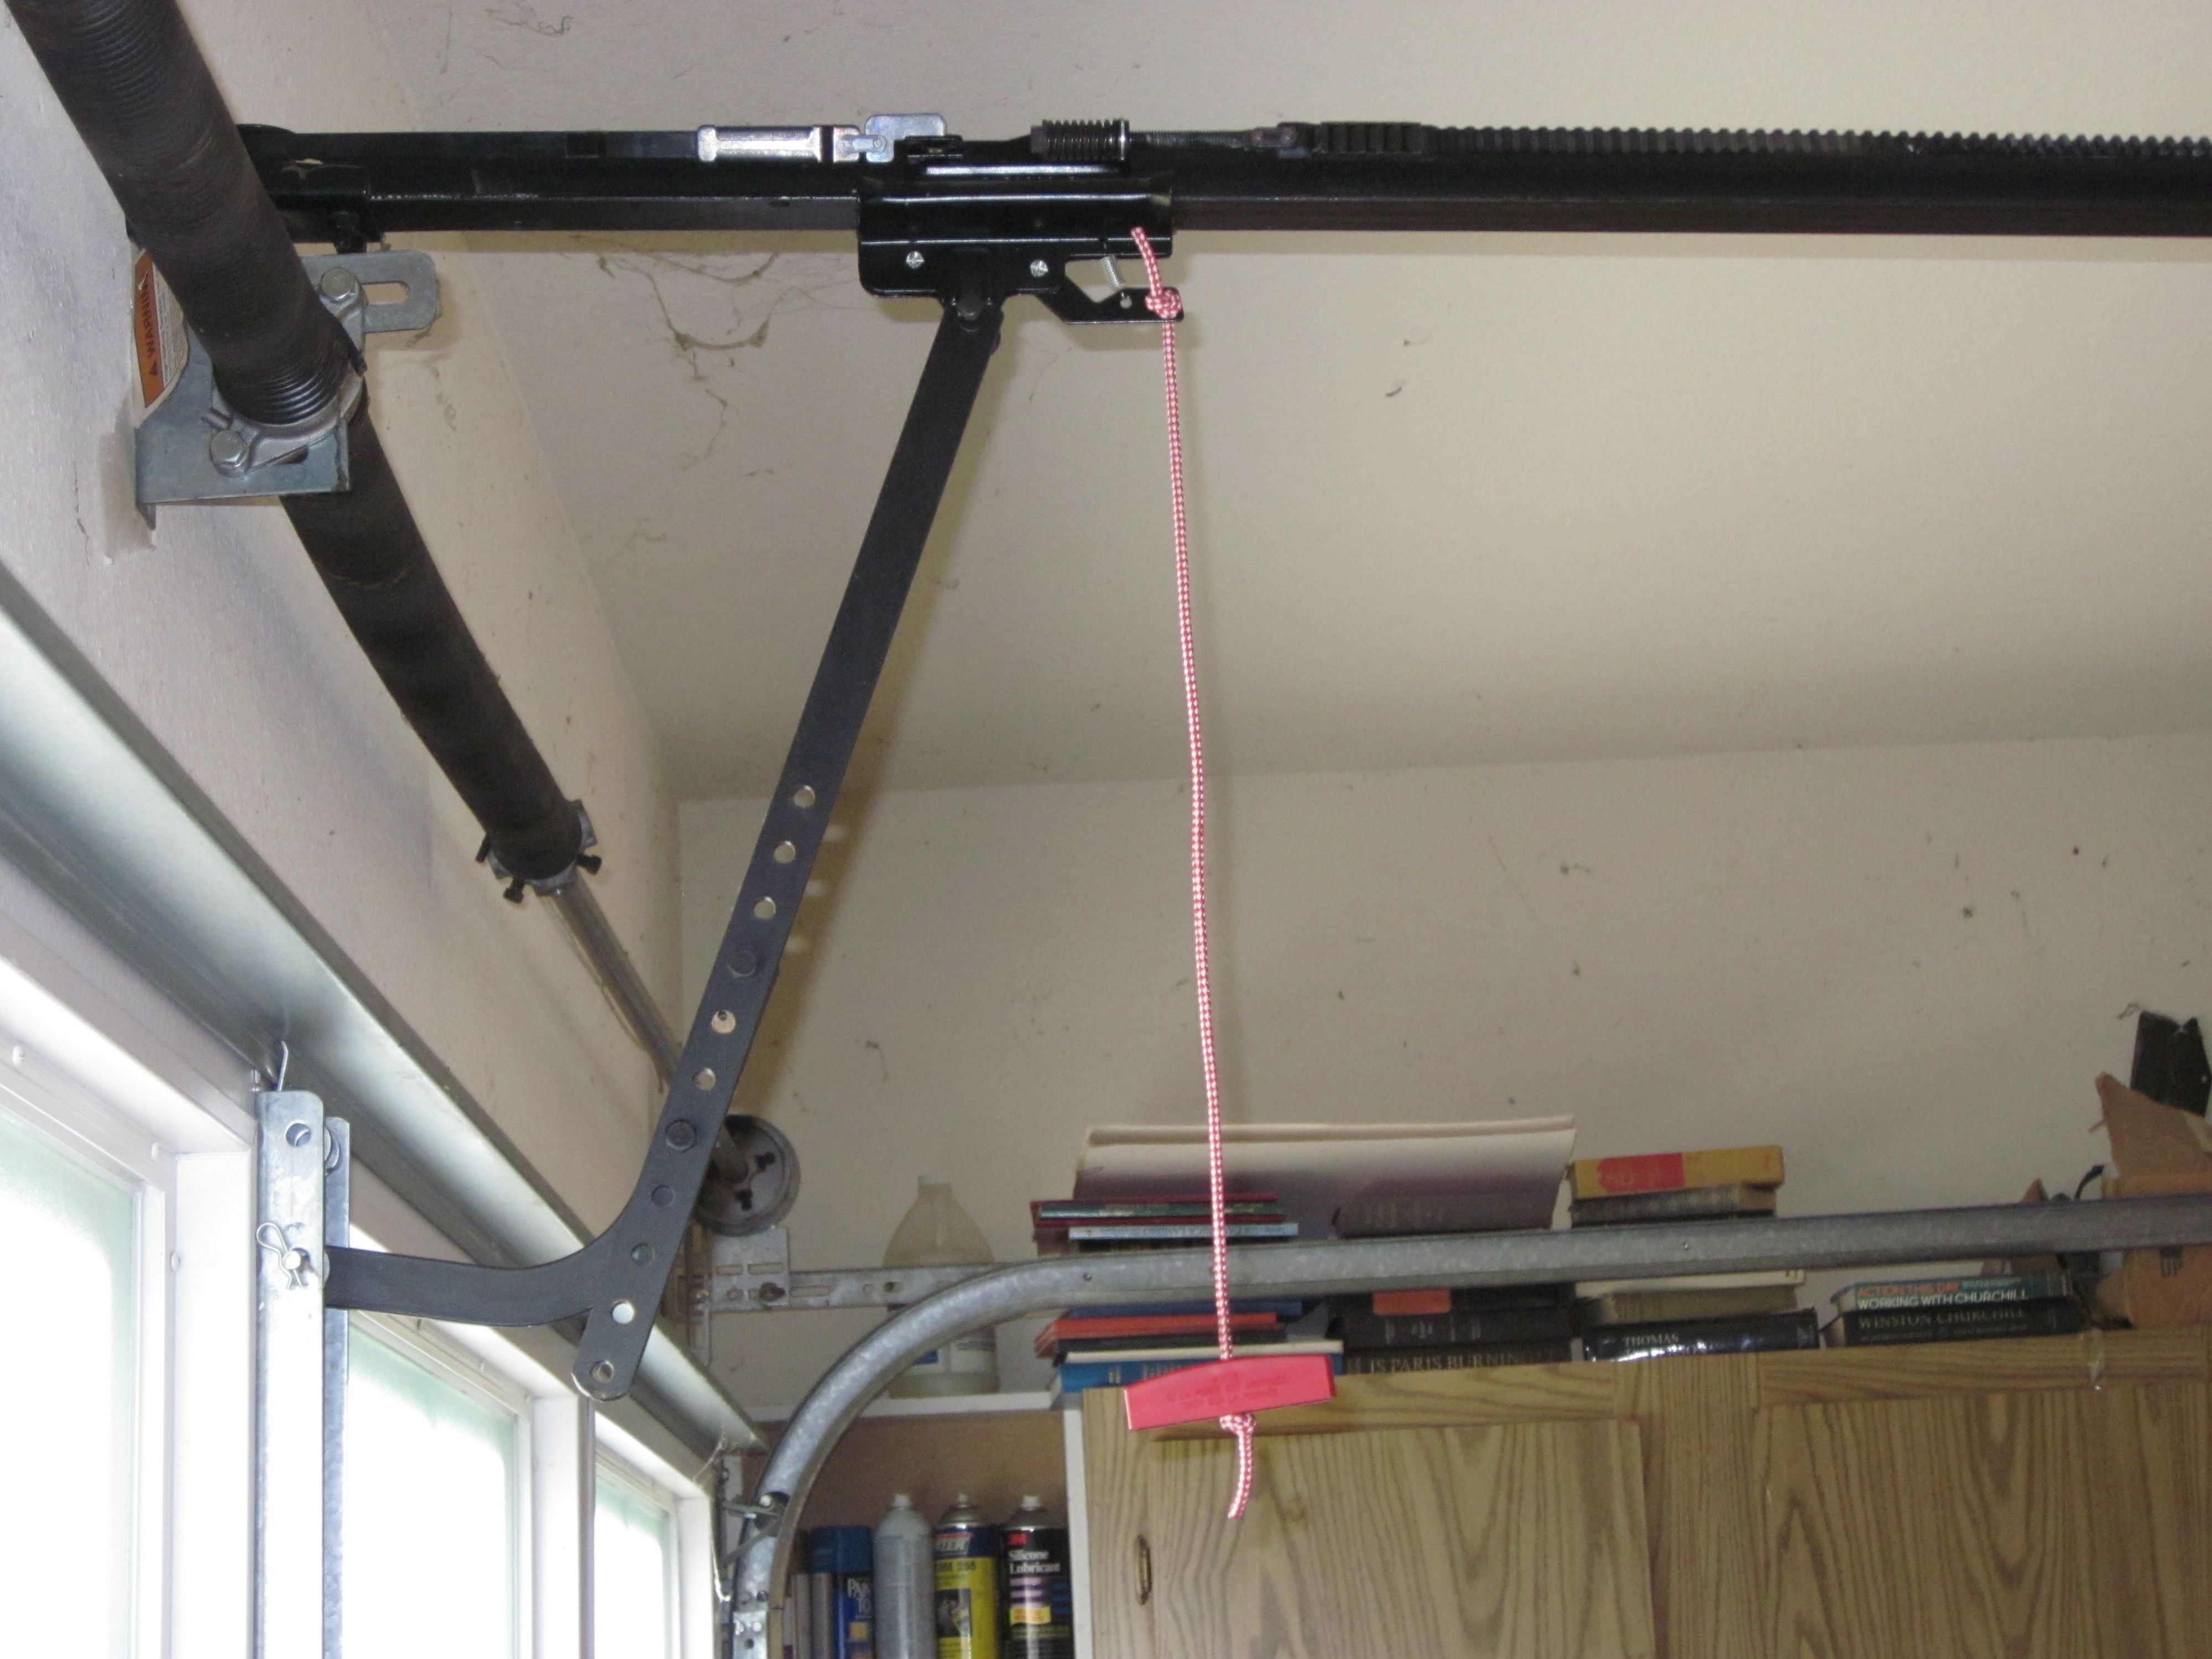 Garage Door Lift Cable Broke For Residence Httpvoteno123